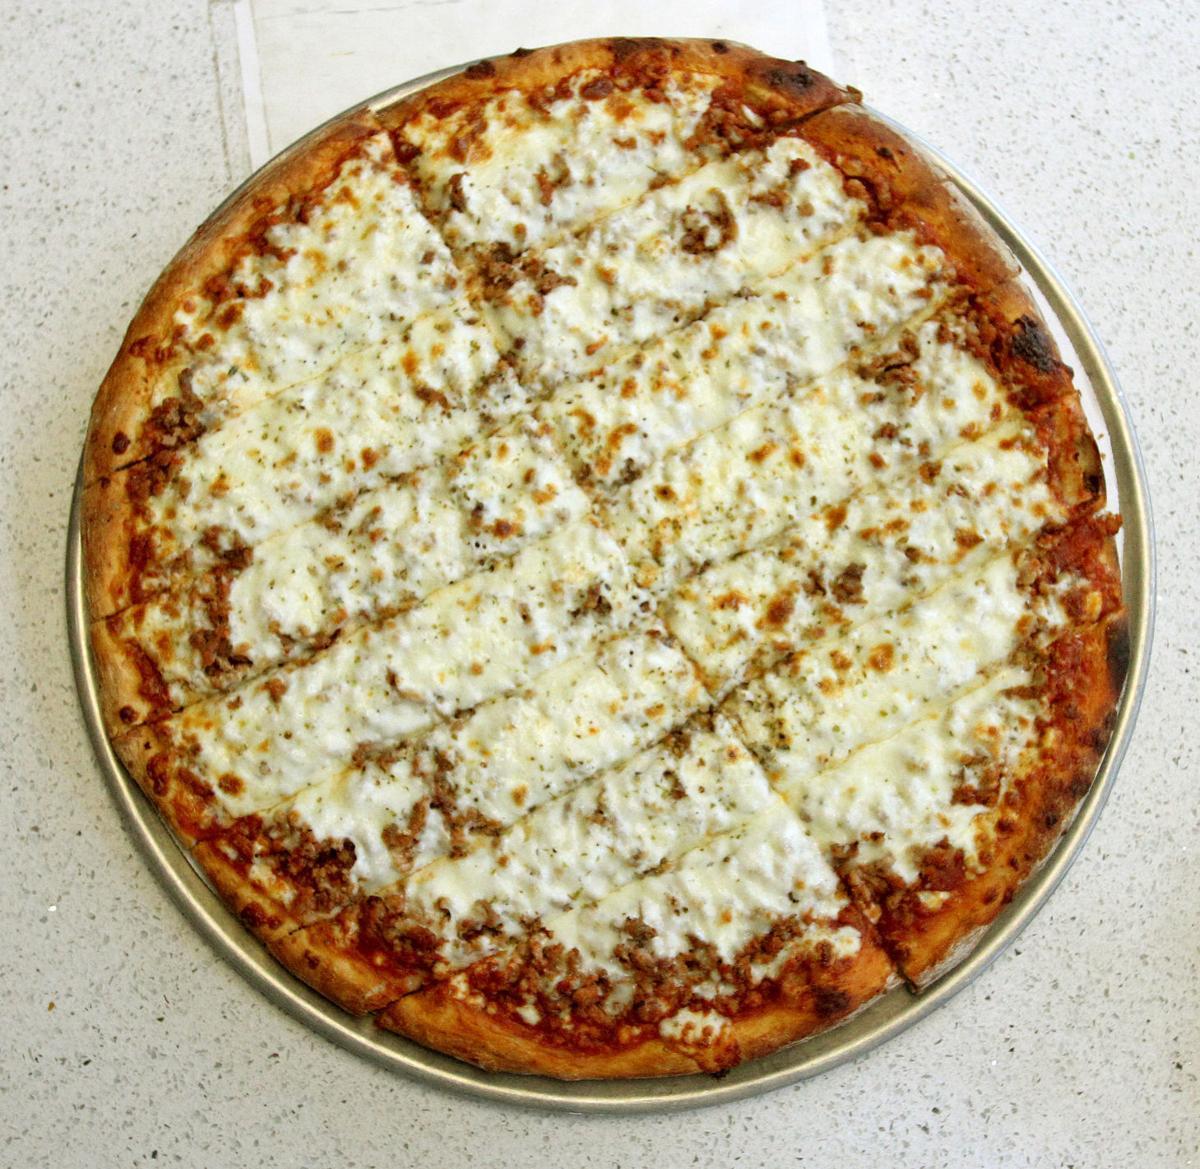 081319-mda-nws-pizzafavs-003 (copy)